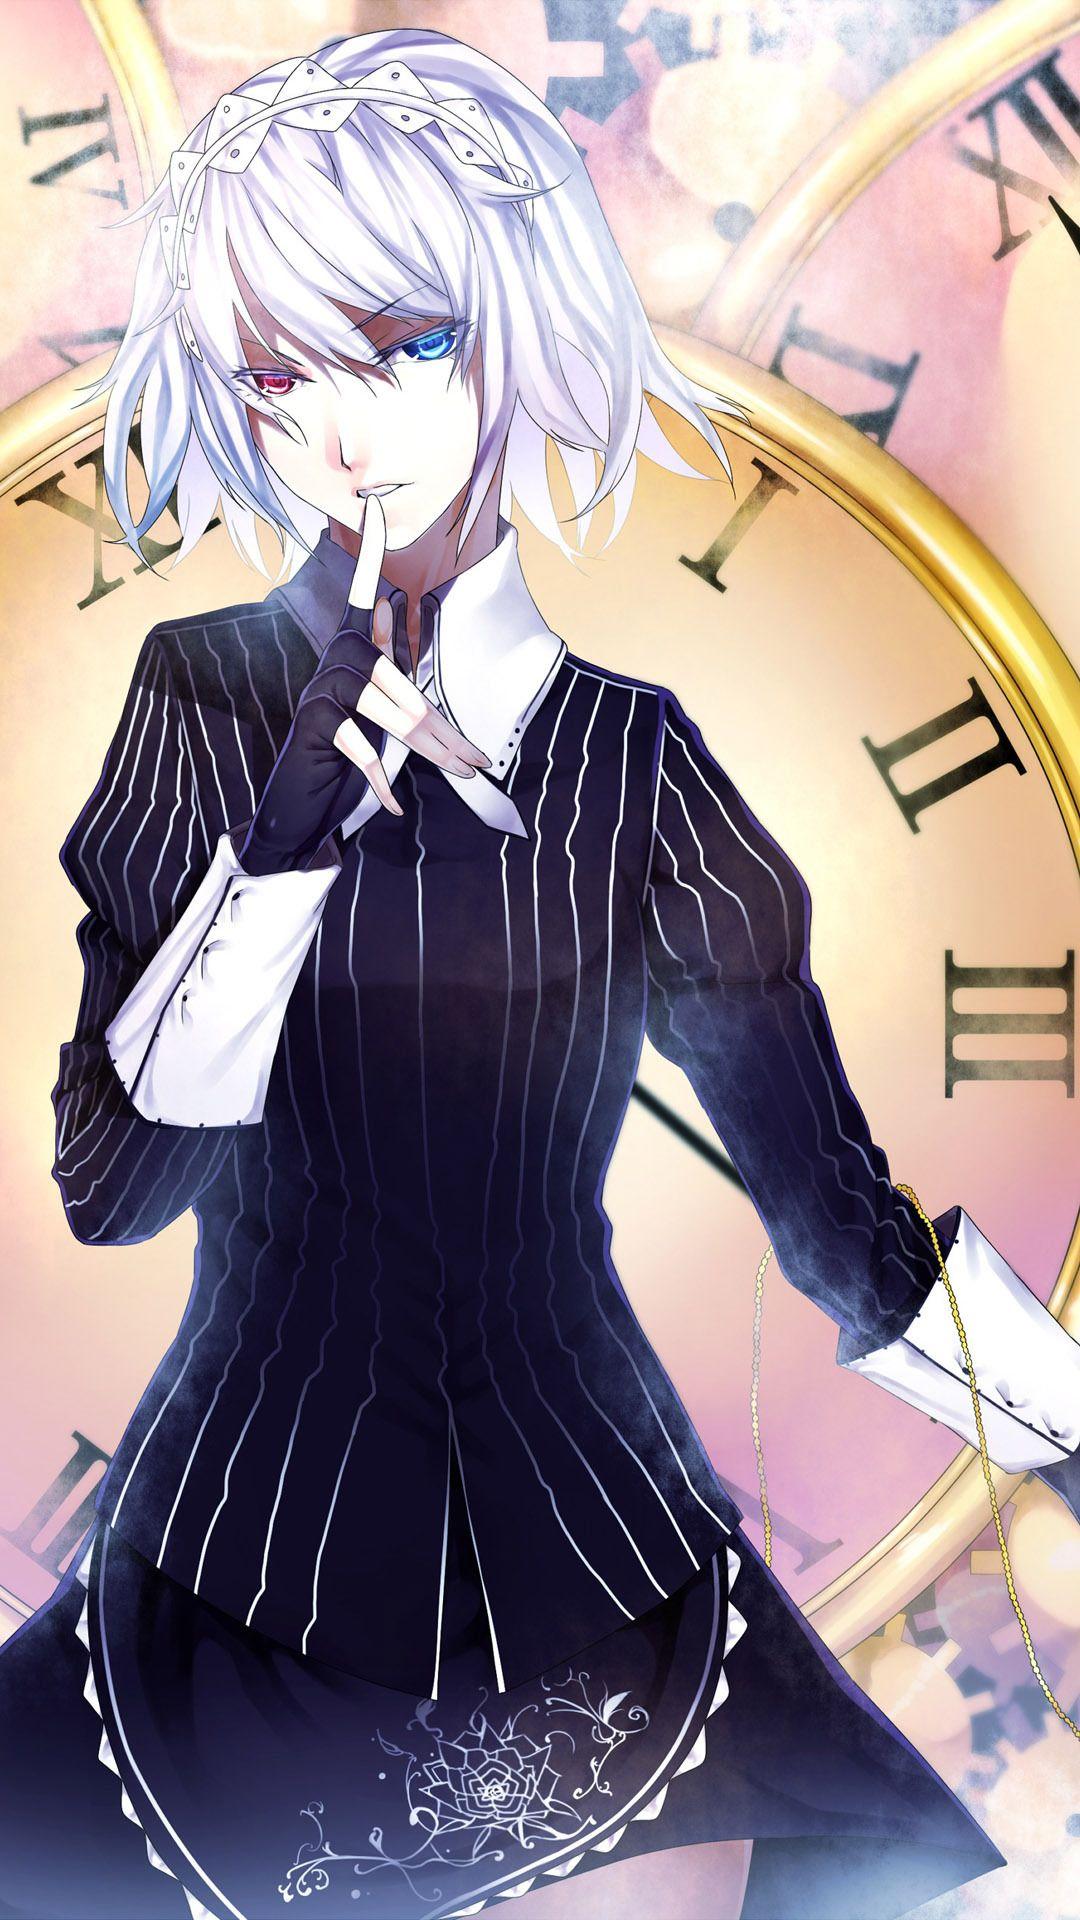 Inspiring anime mobile phone wallpaper sakuya izayoi - Anime wallpaper for smartphone ...